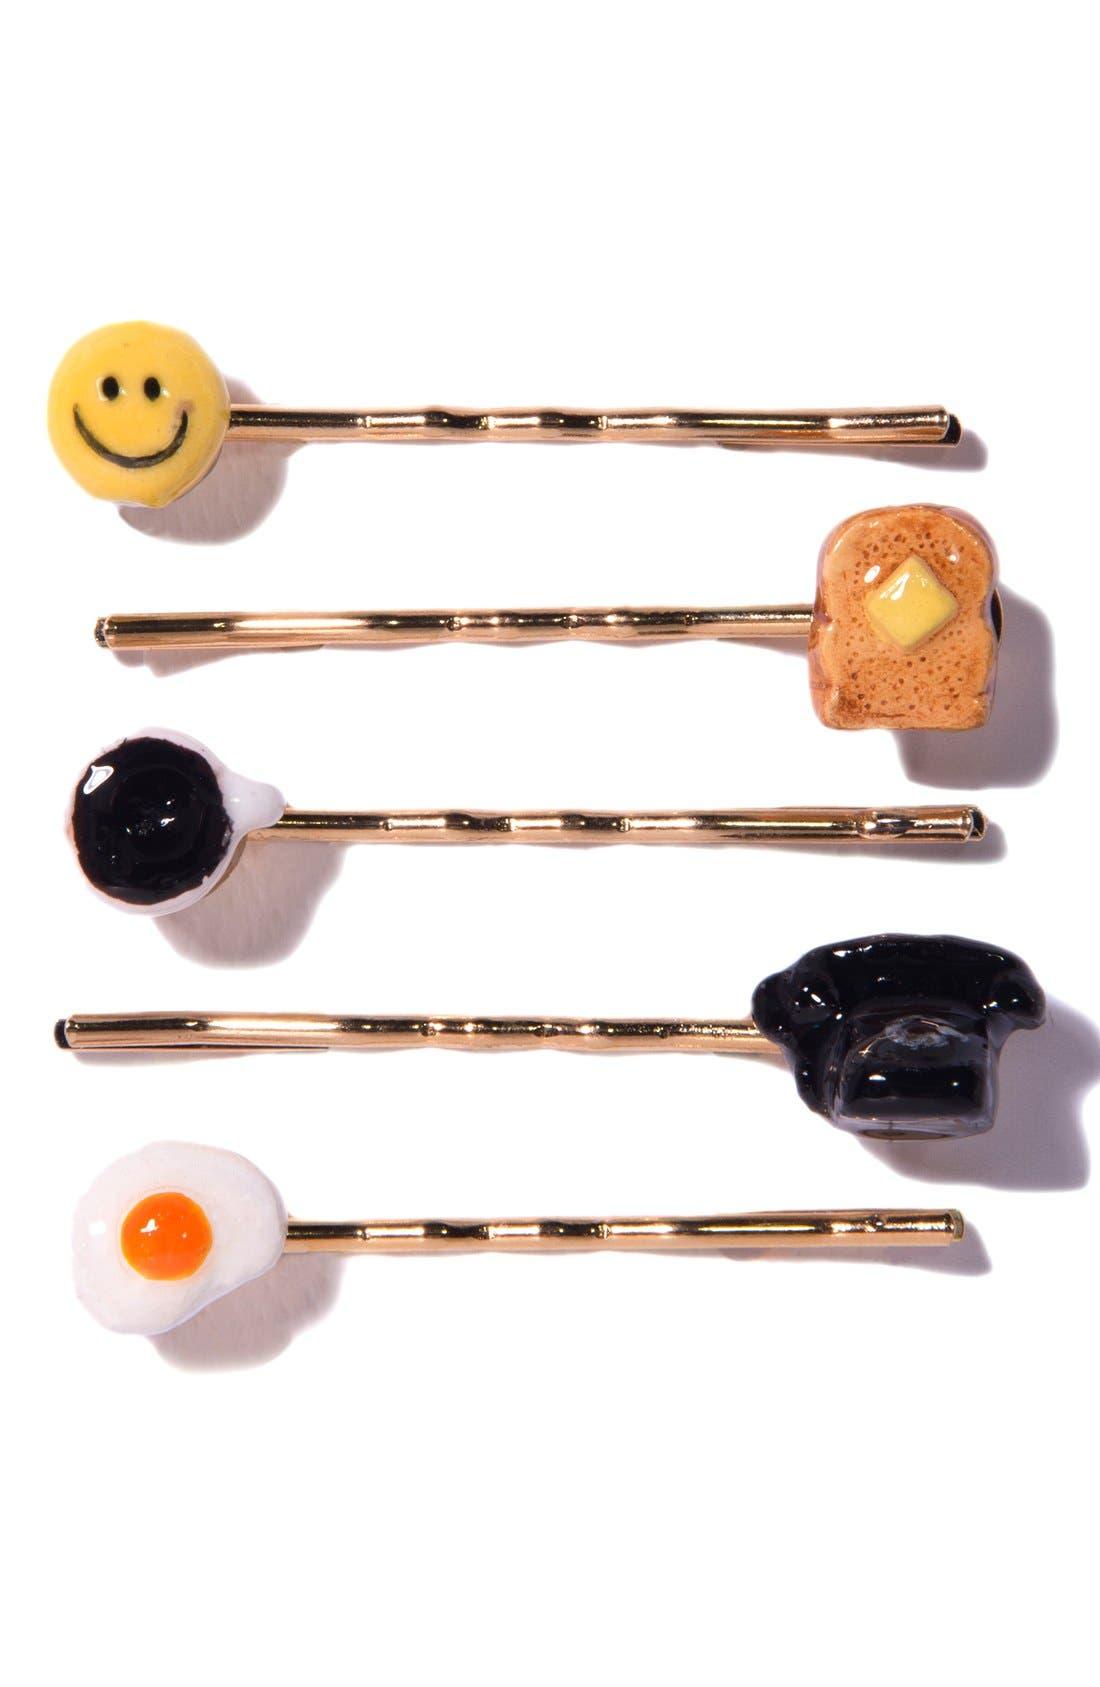 Main Image - Venessa Arizaga 'Brunch Time' Bobby Pins (Set of 5)